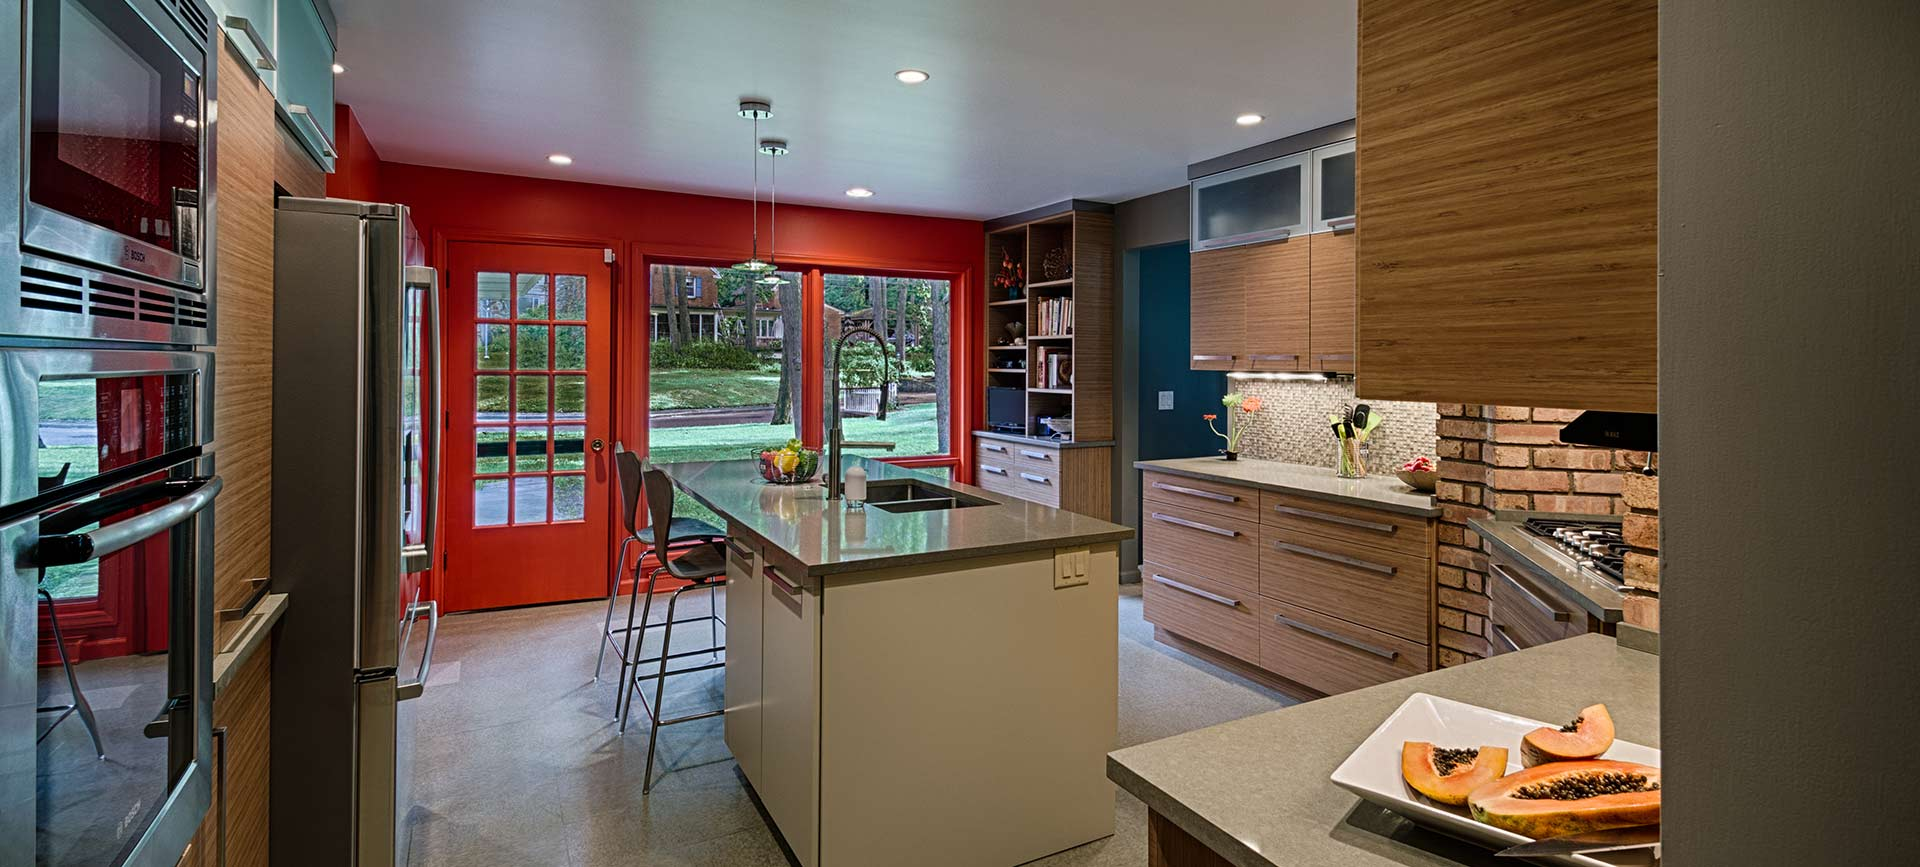 Kitchen And Bath Design Grand Rapids Mi